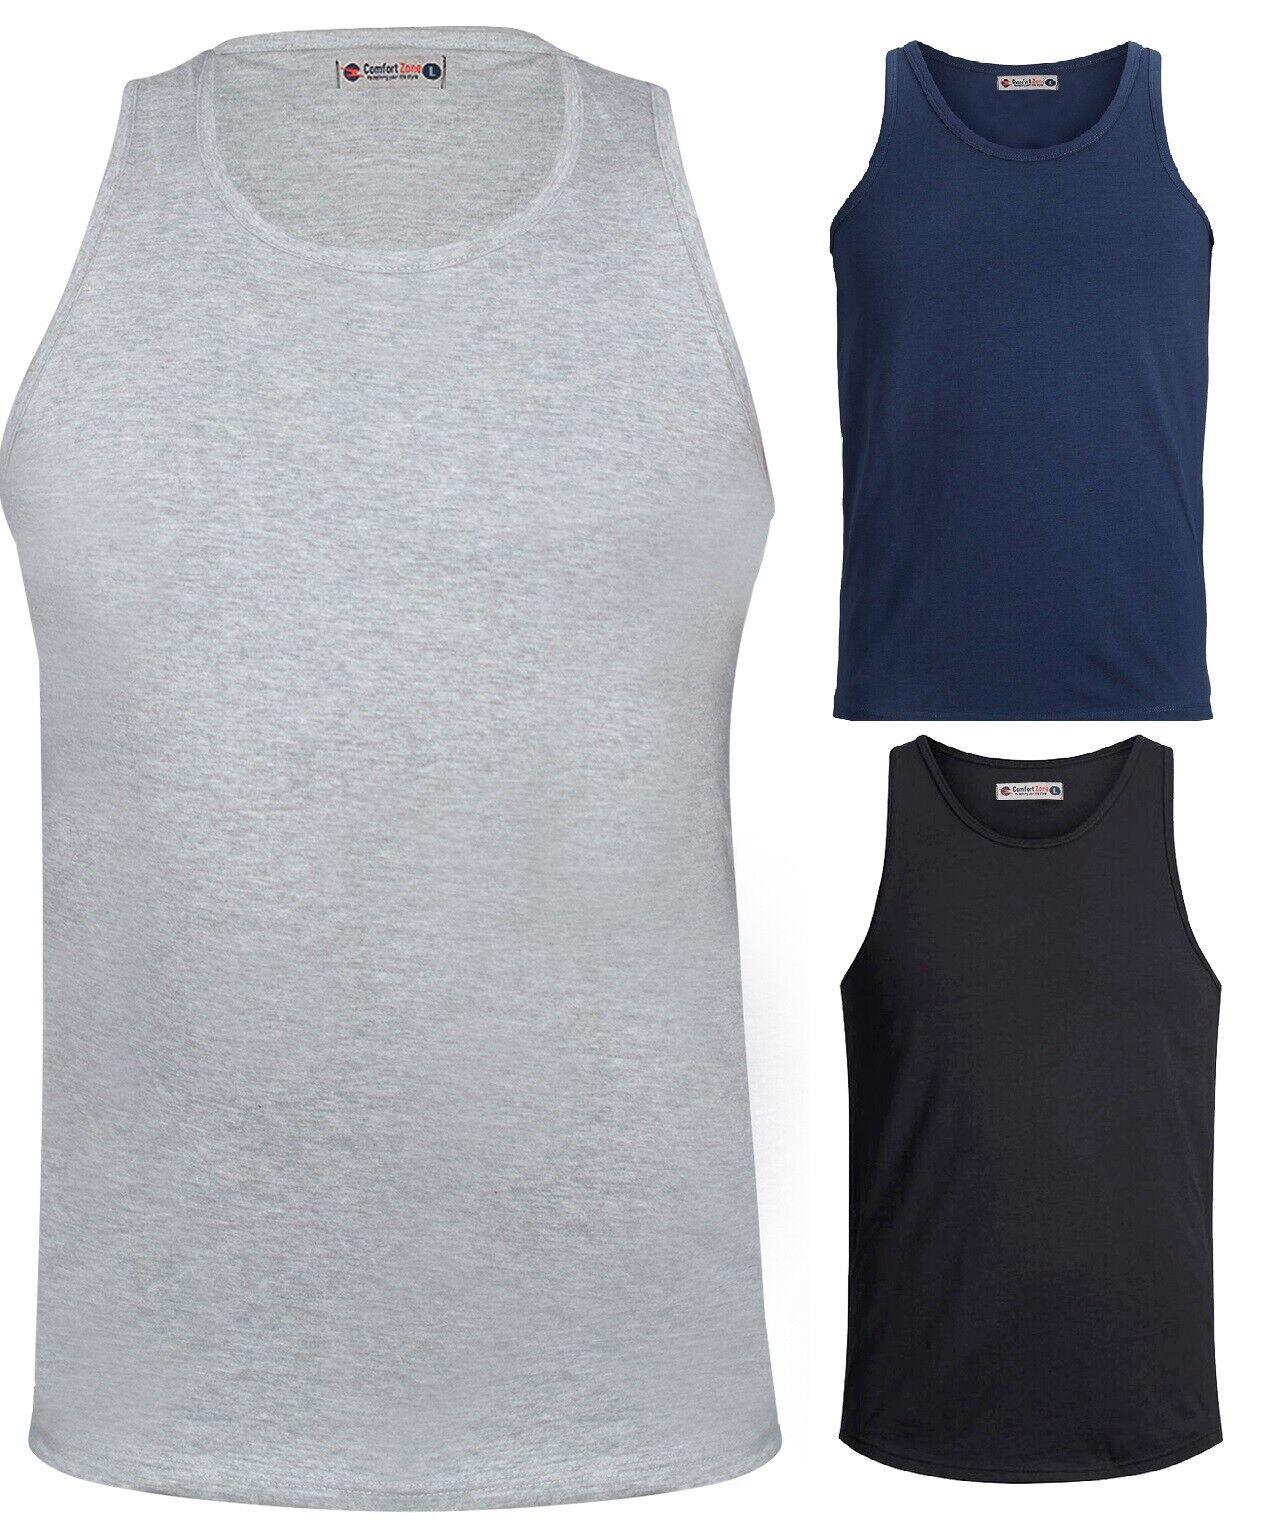 Mens Plain Vest Sleeveless Tank Top Training Gym Rbbed BodyBuilding Vests M-6XL